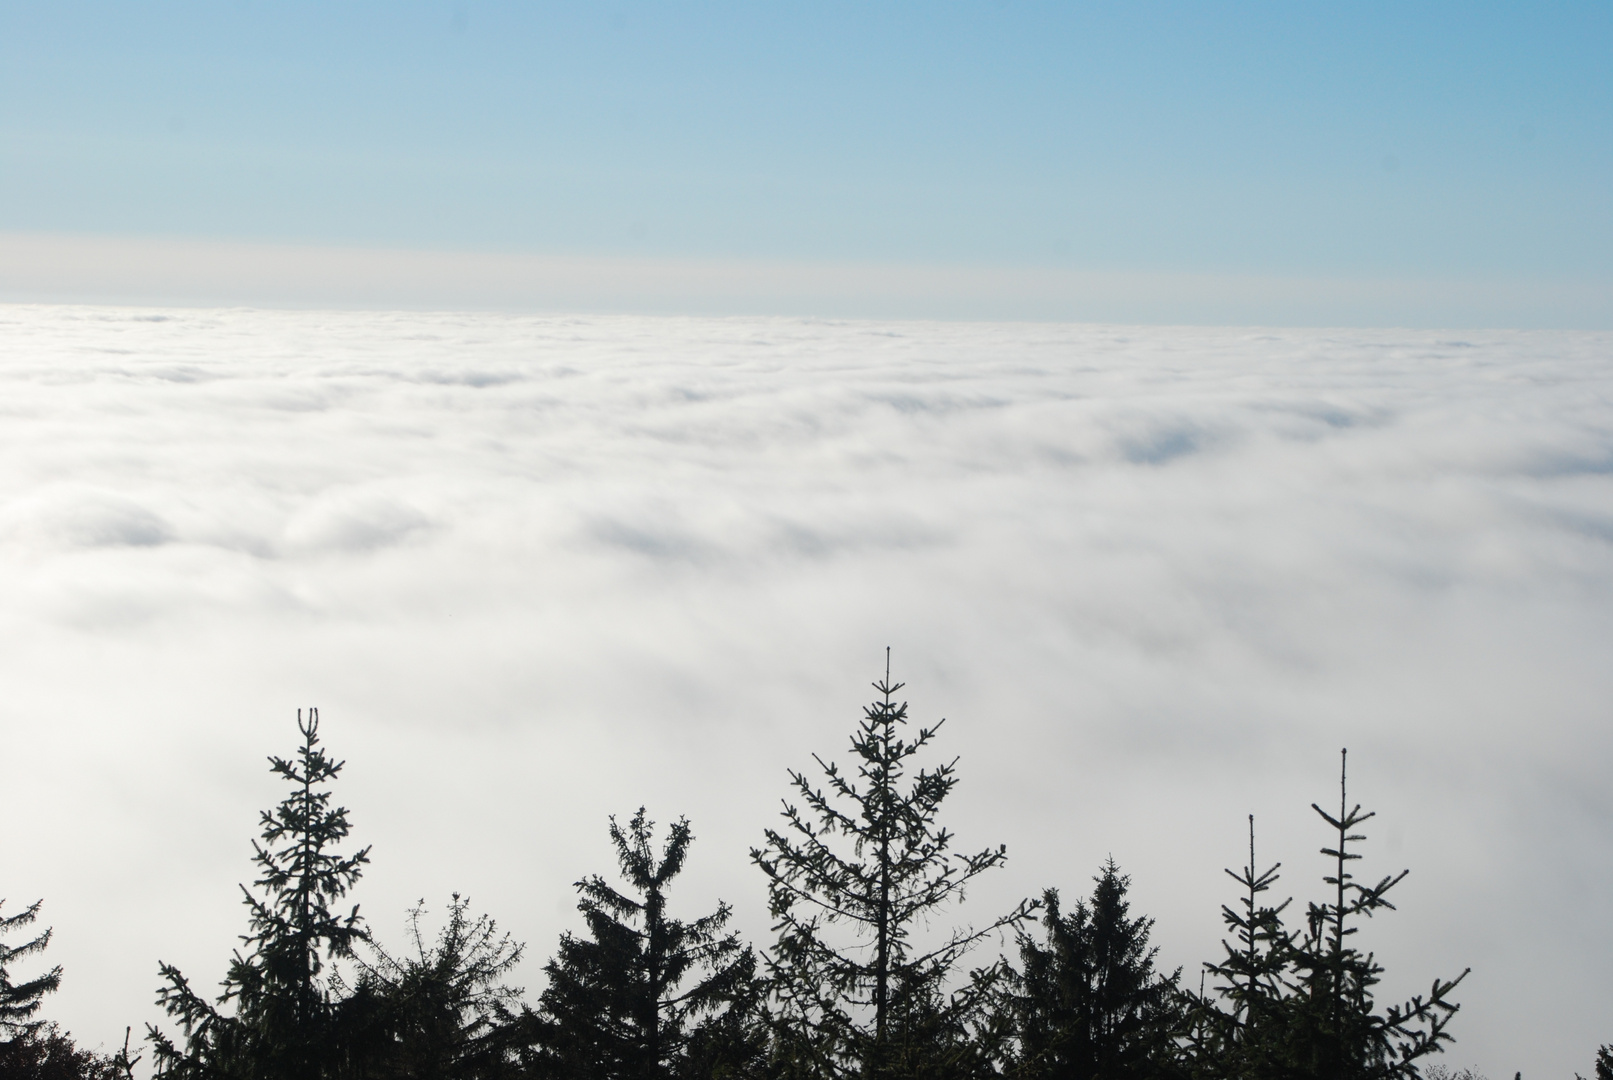 Aussichtsturm Alpenblick